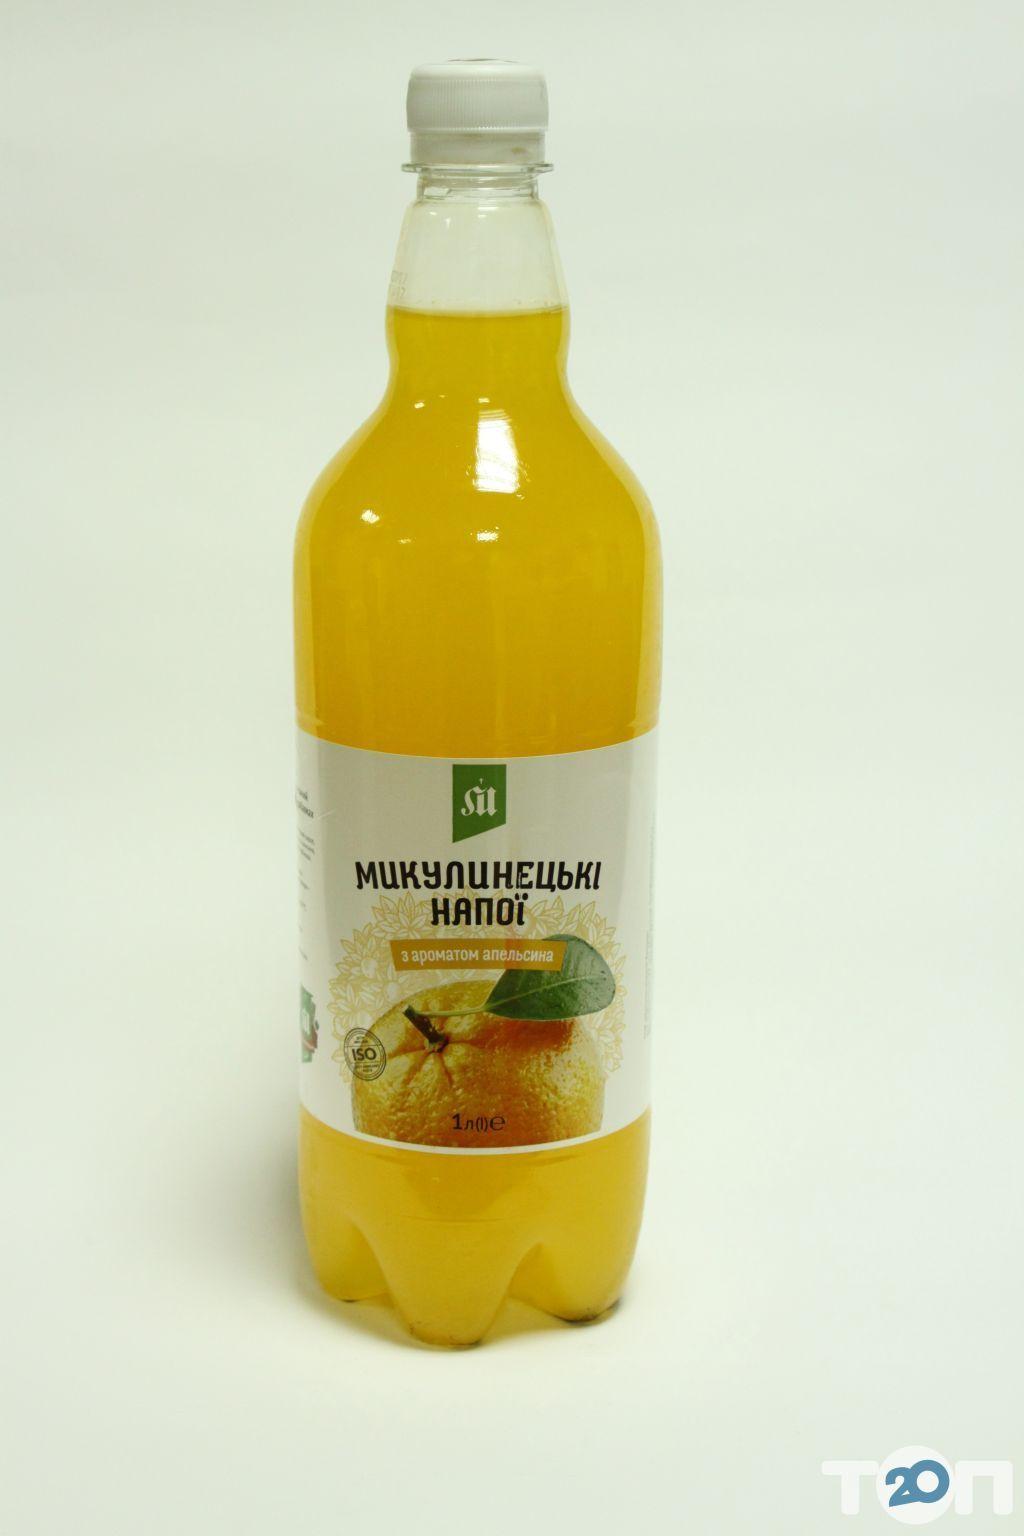 Микулинецький Бровар, виробник безалкогольних напоїв - фото 1